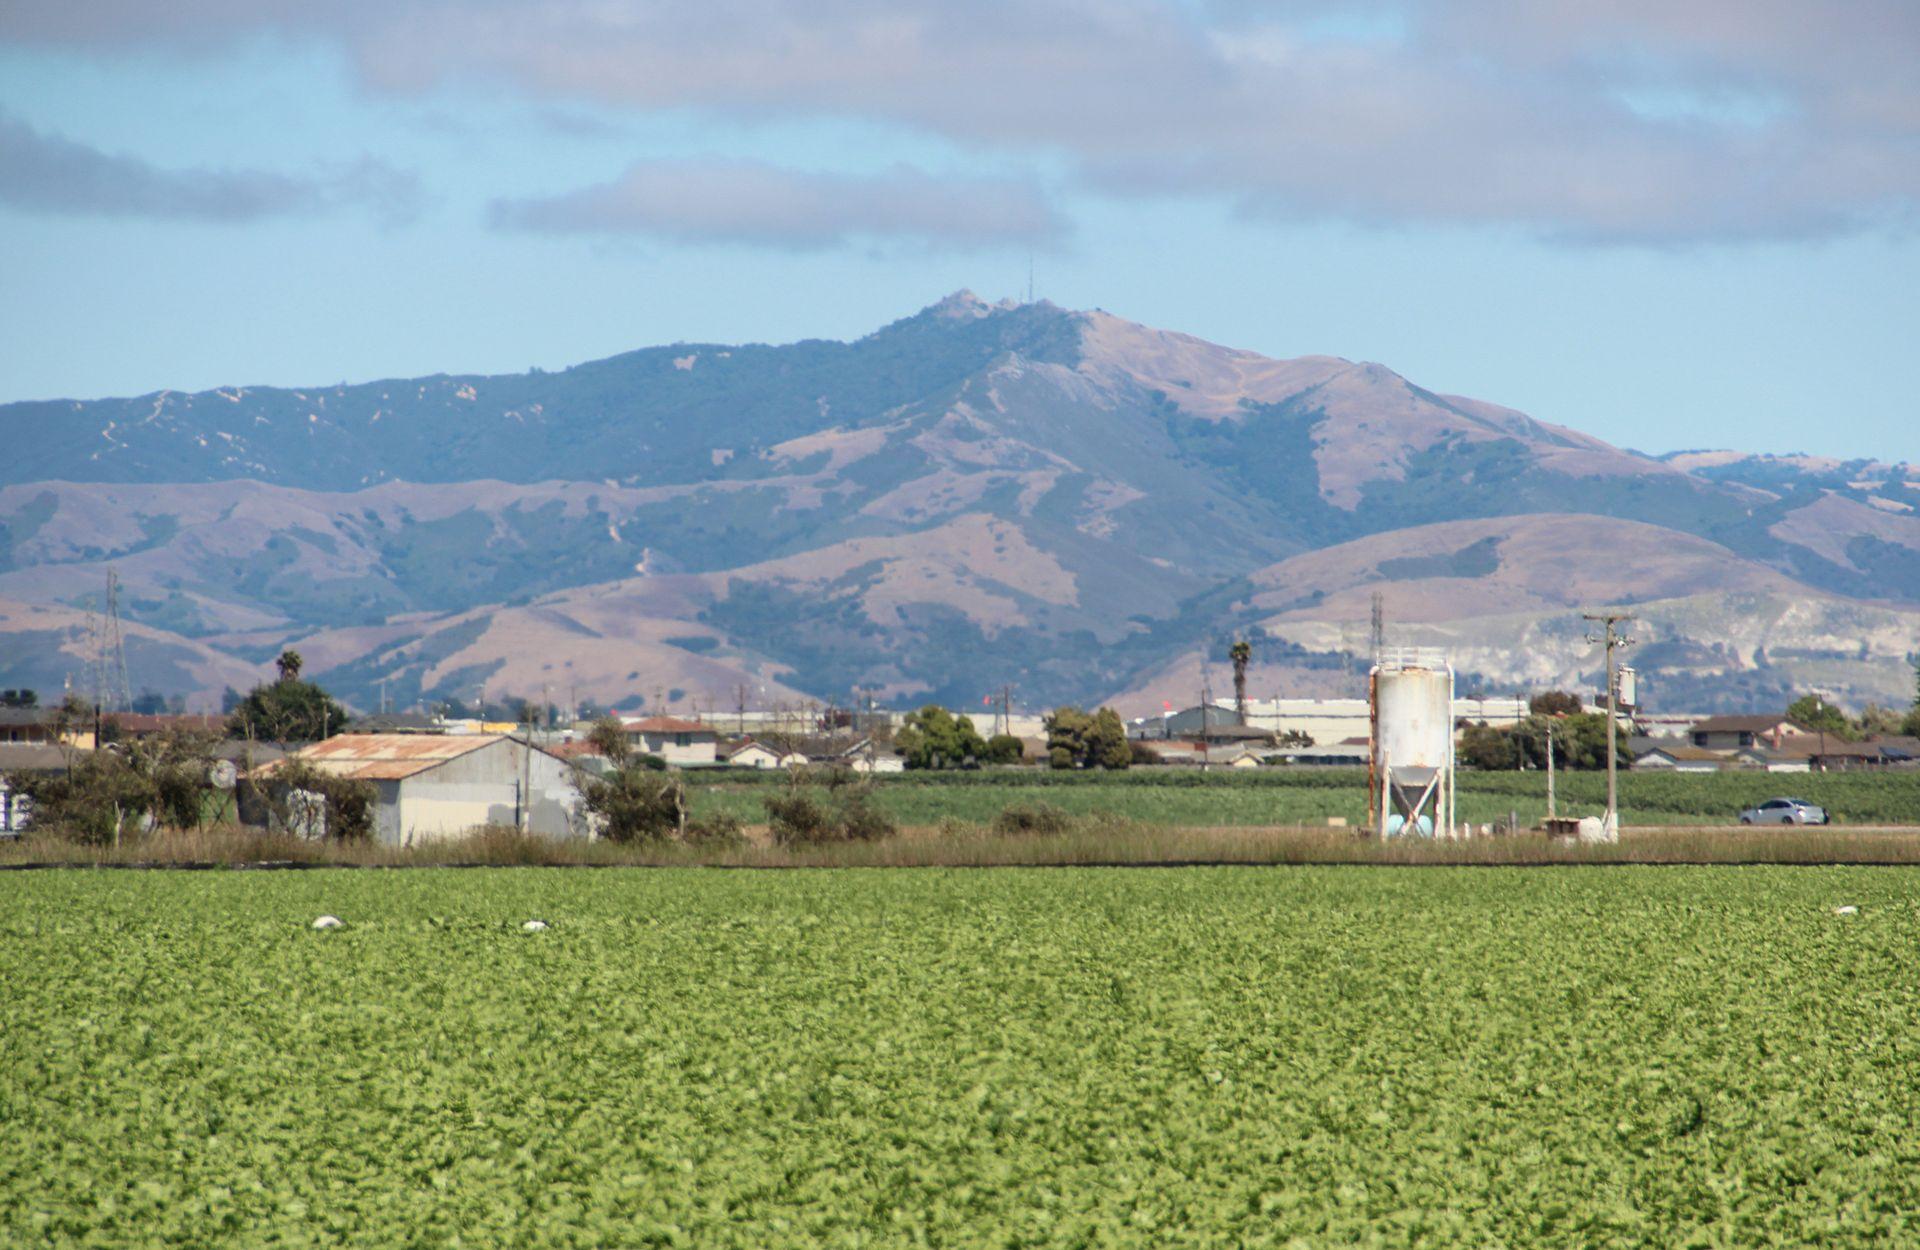 Fremont Peak California Wikipedia